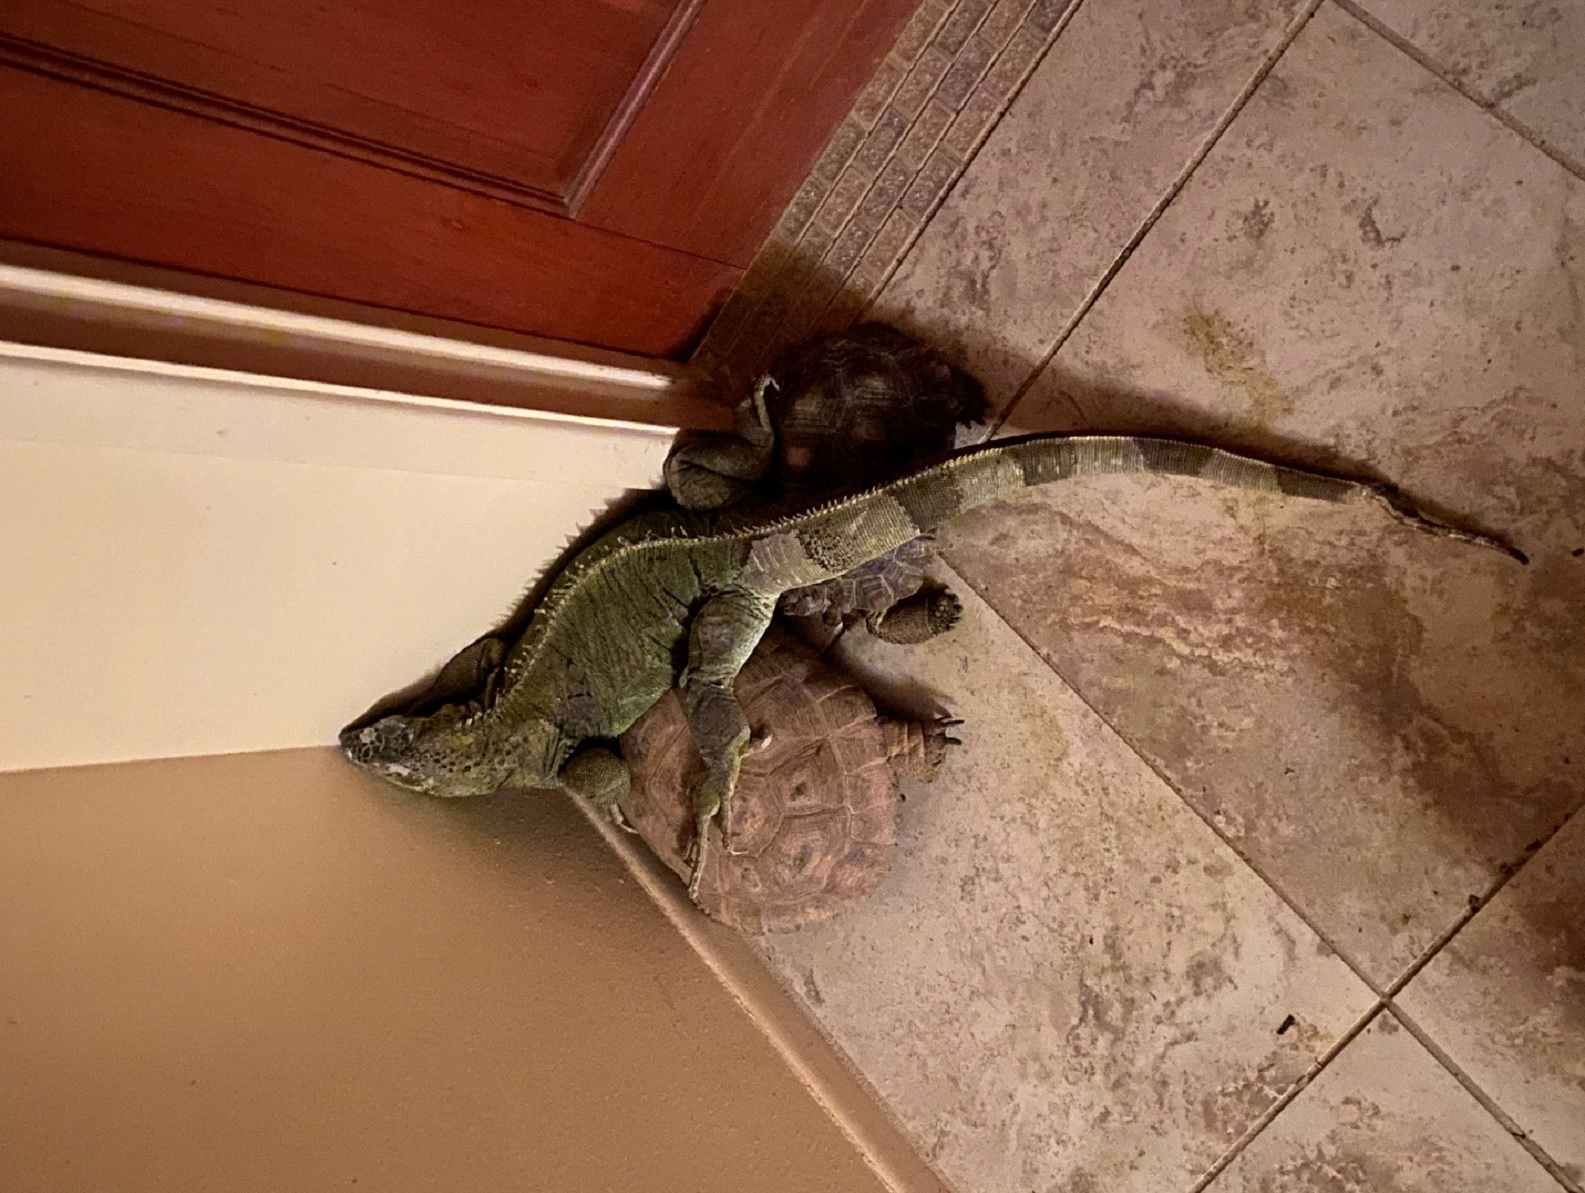 Two tortoises and a green iguana sleep together